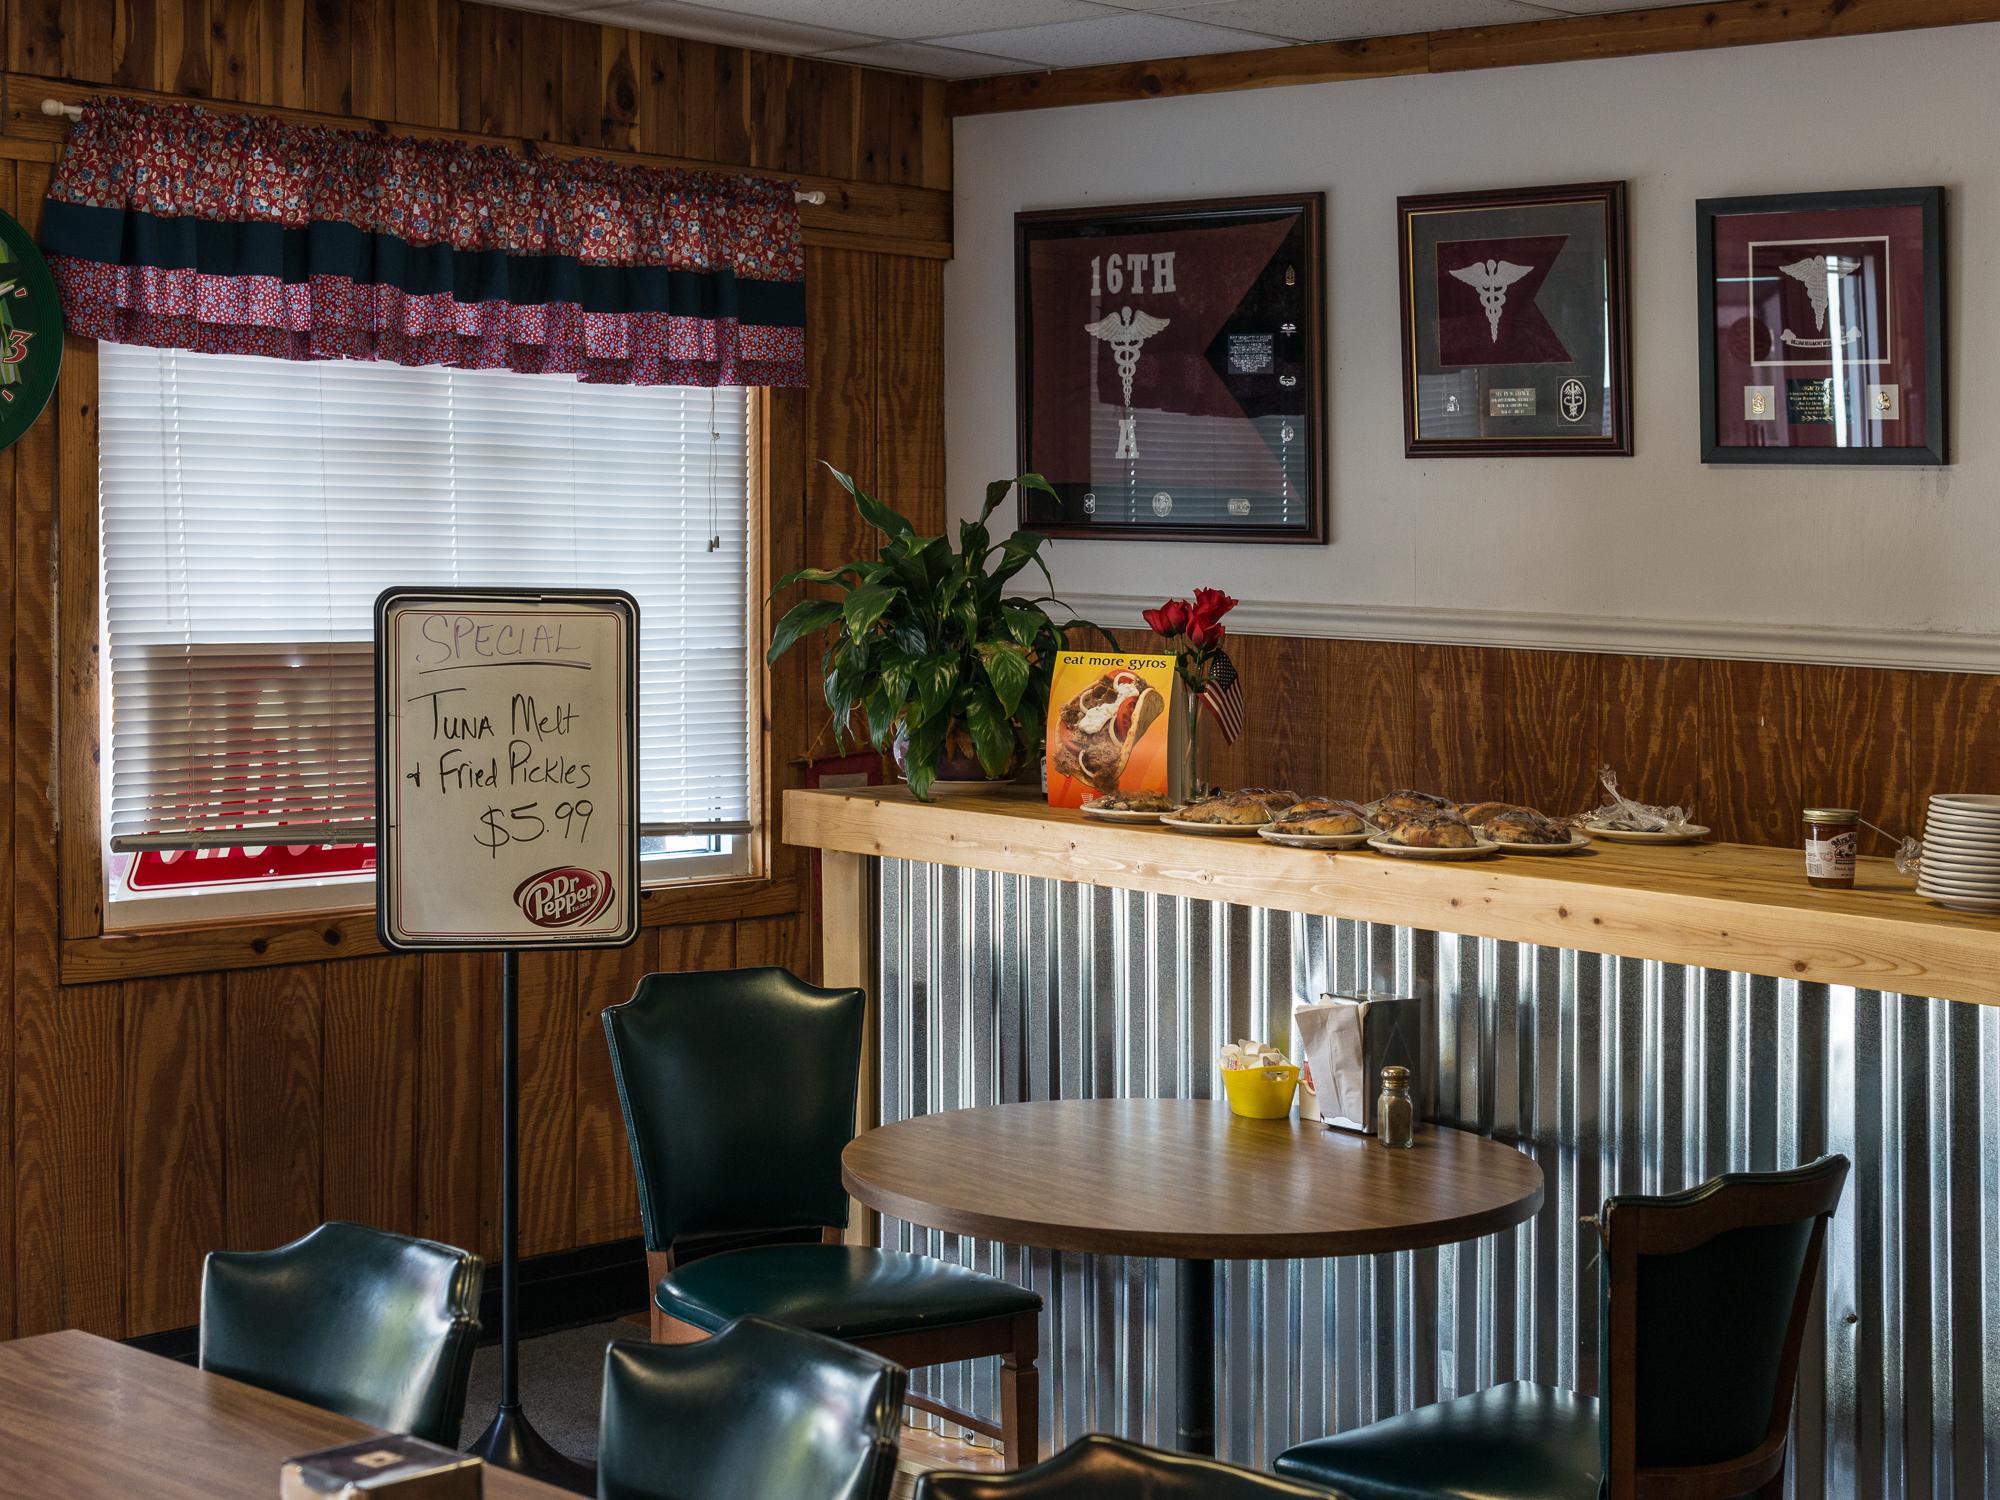 Country Store and Café, Edgar Springs, Missouri, 2016